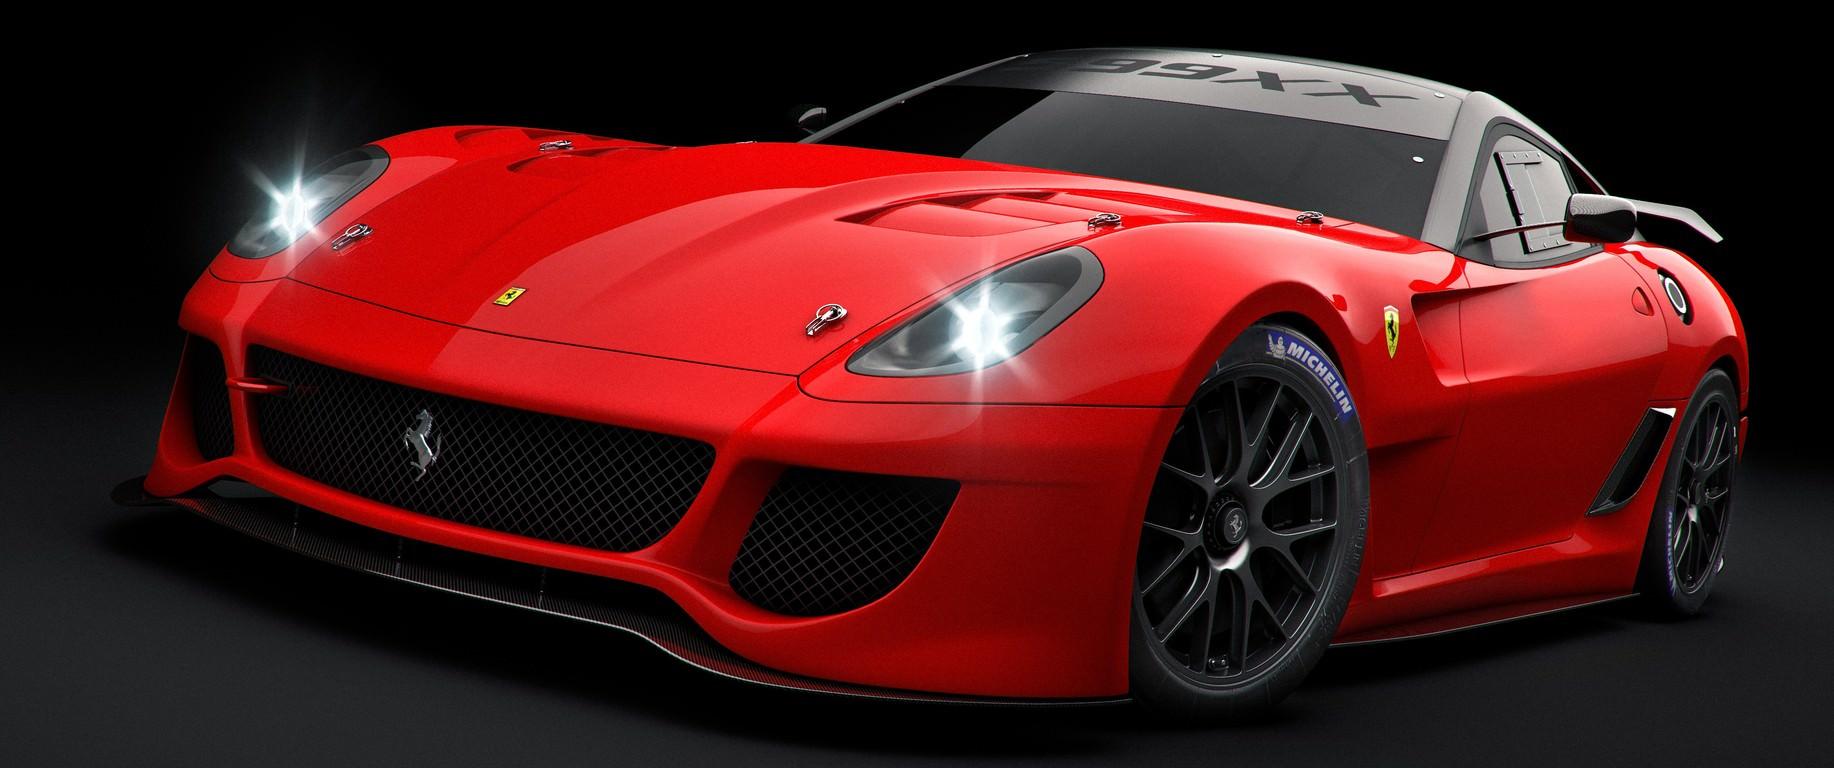 Red Le Mans Ferrari Wallpaper